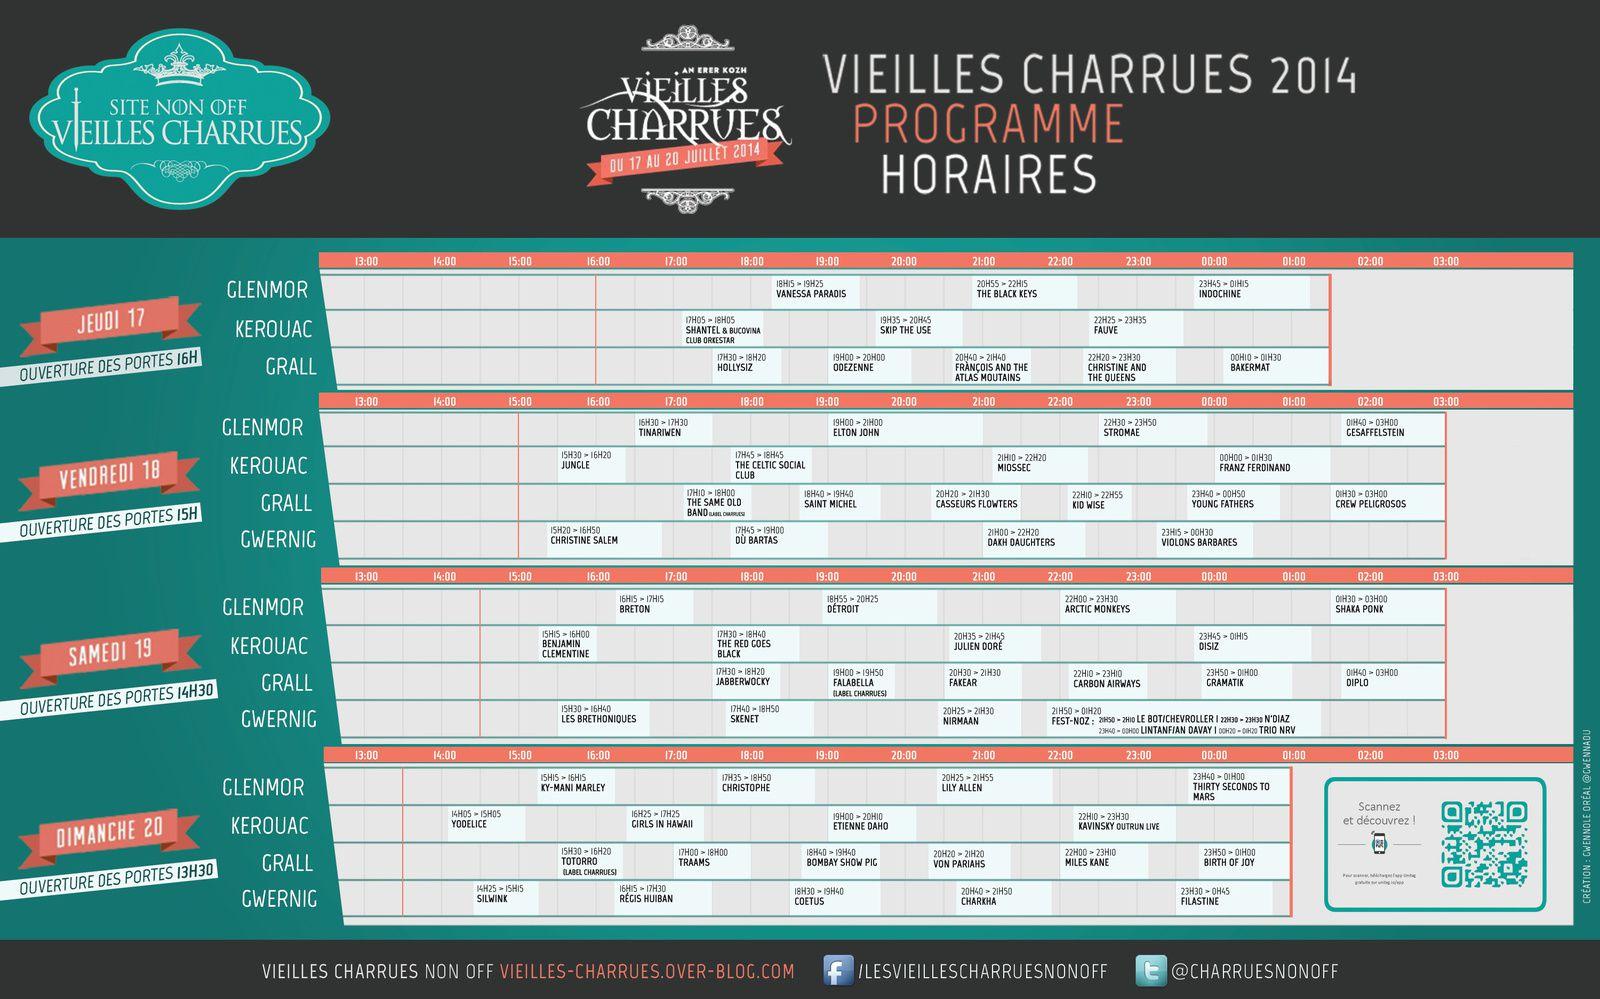 Charrues 2014 - Page 9 Ob_a0e0ed_charrues-2014-horaires-programme